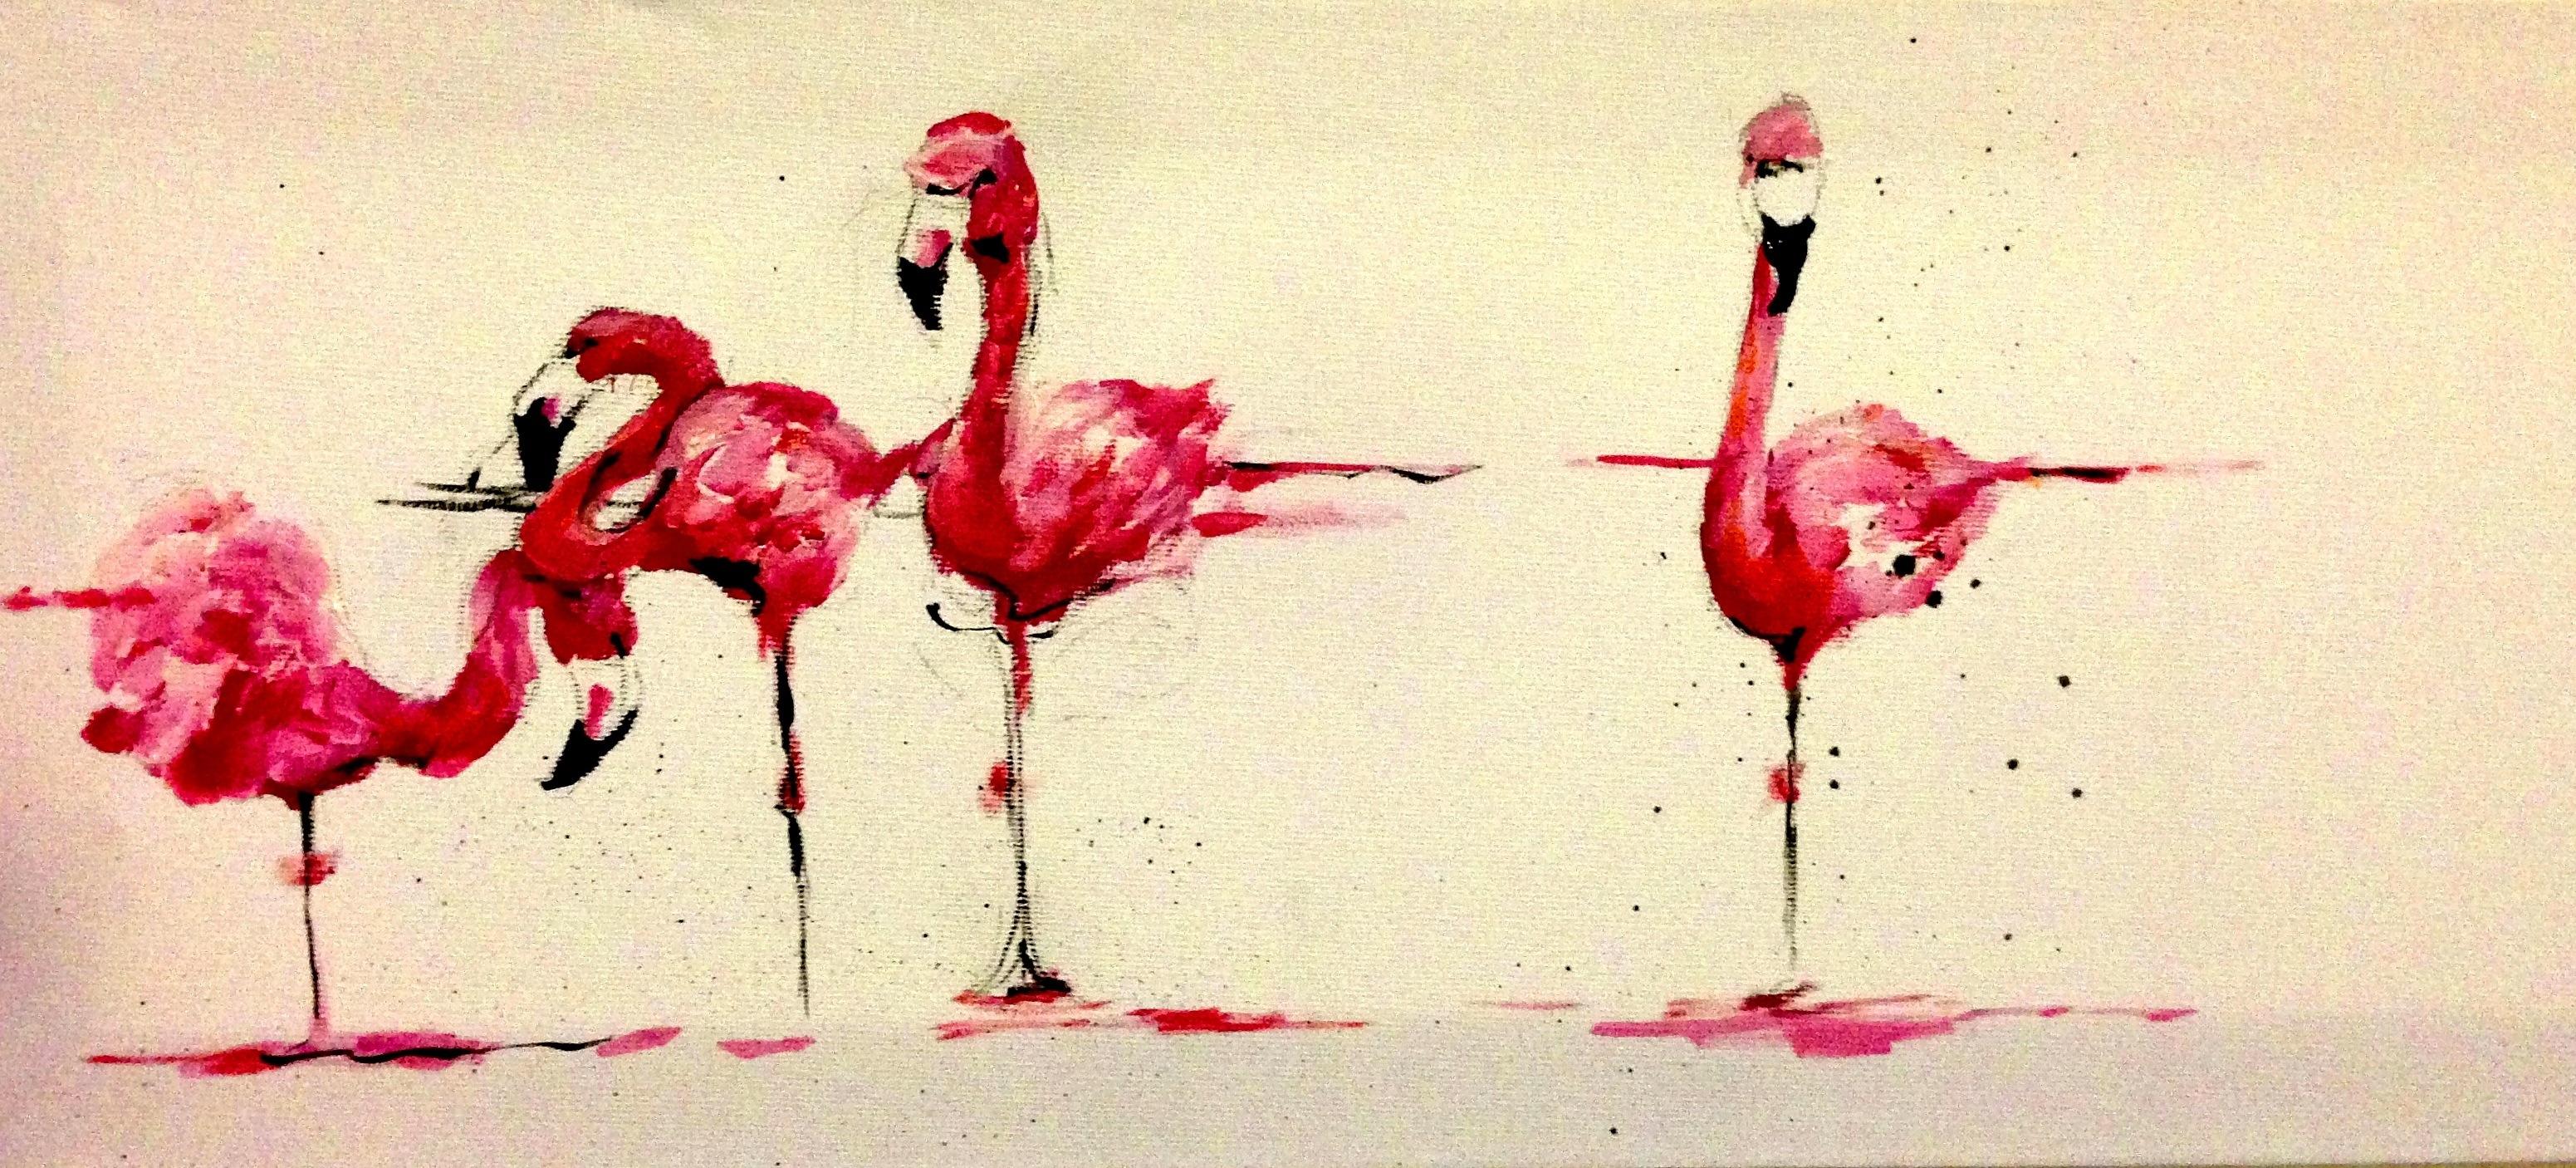 More flamingos | KATY JADE DOBSON